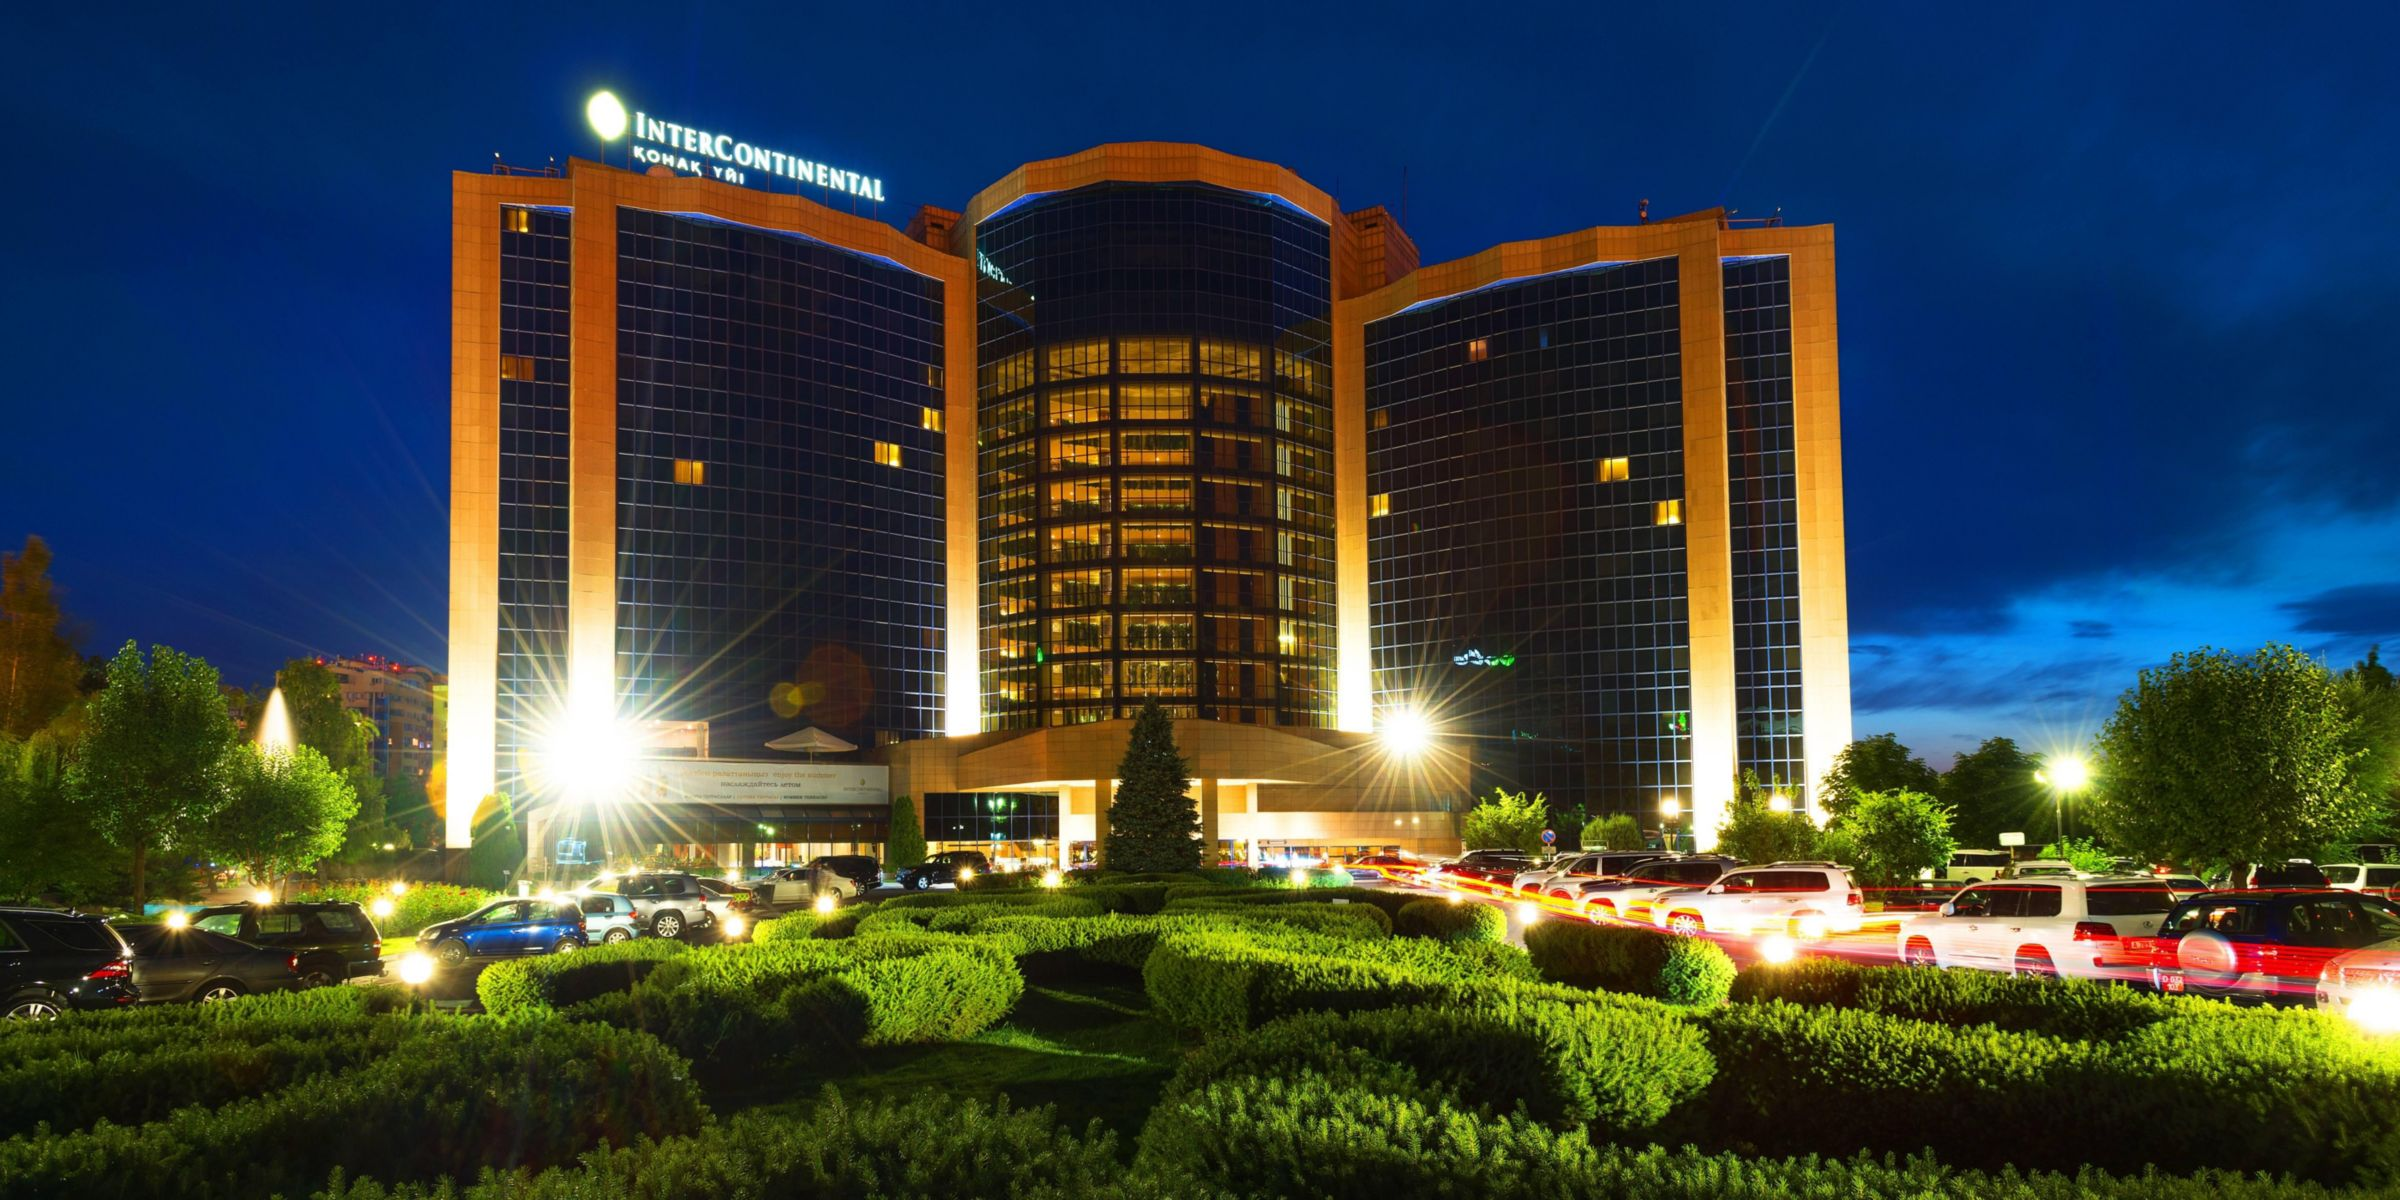 Republic Square Area Attractions Almaty Kazakhstan Hotel Exterior